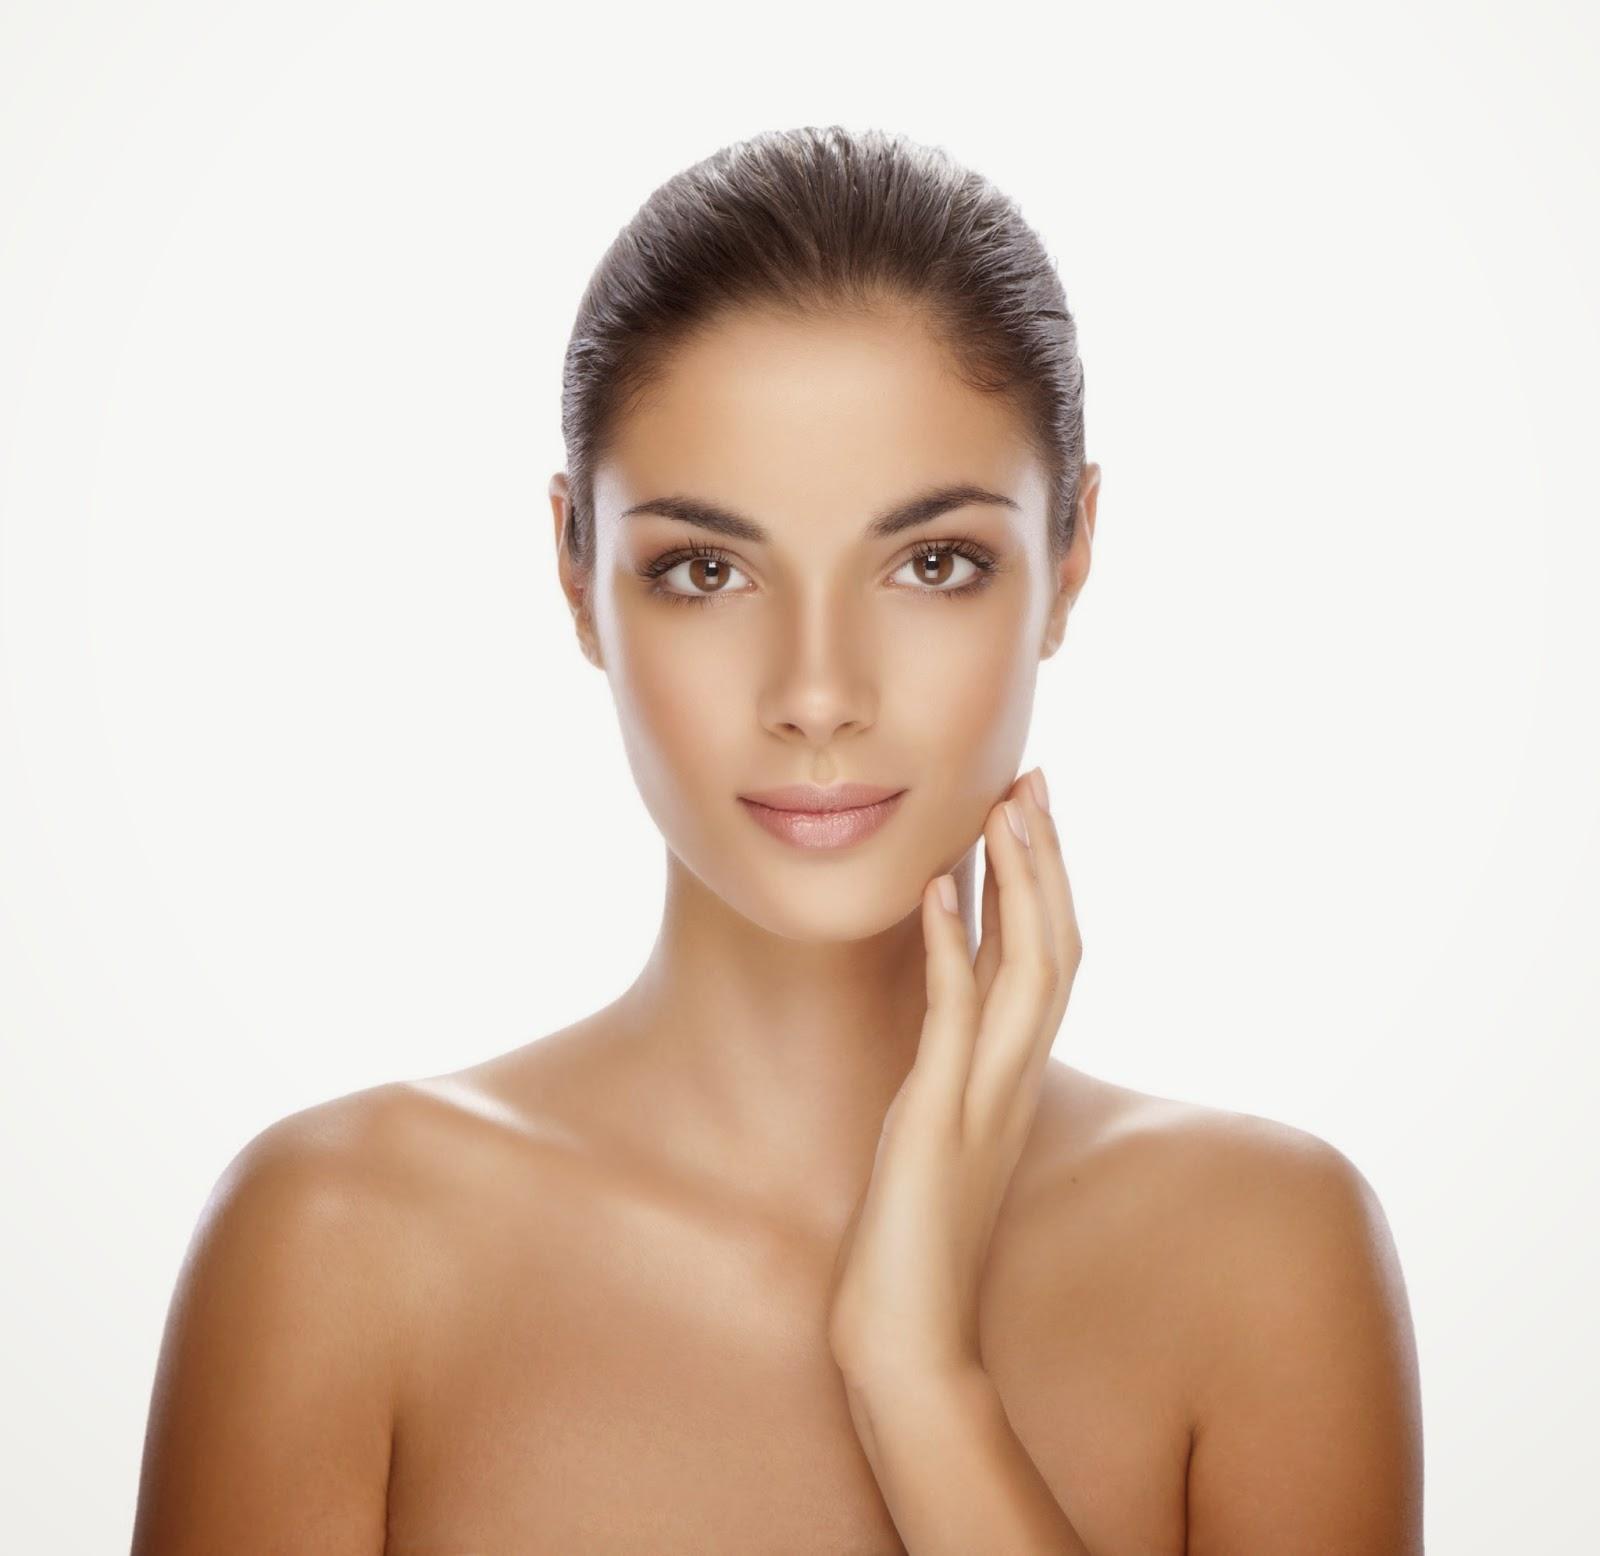 Biotique: Look Beautiful Naturally - Natural Beauty Tips